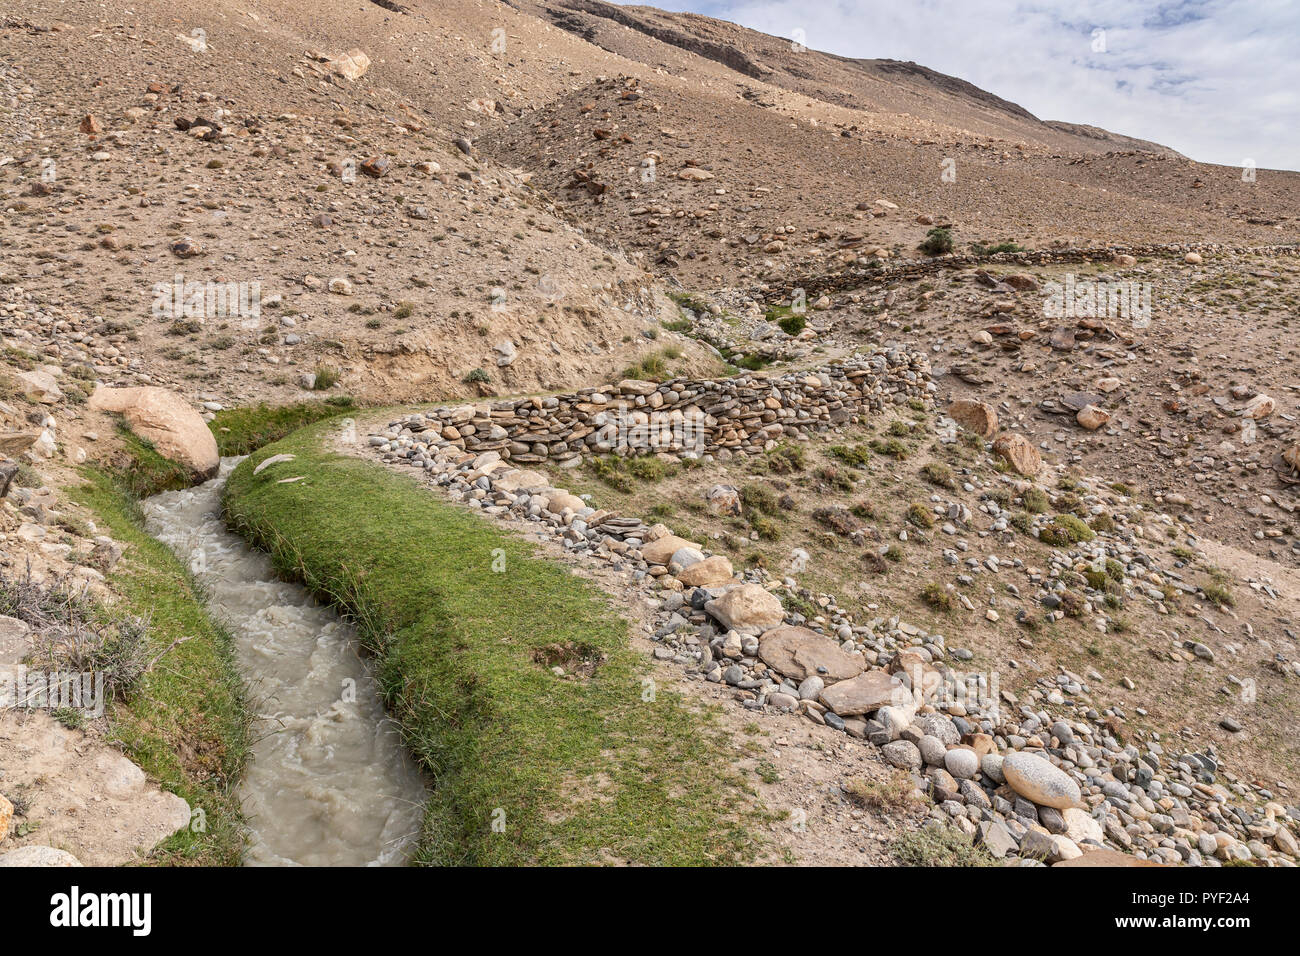 Typical traditional Central Asian water canal, or water dyke carrying water to villages, Langar, Tajik Wakhan, Pamir Mountains, Tajikistan - Stock Image